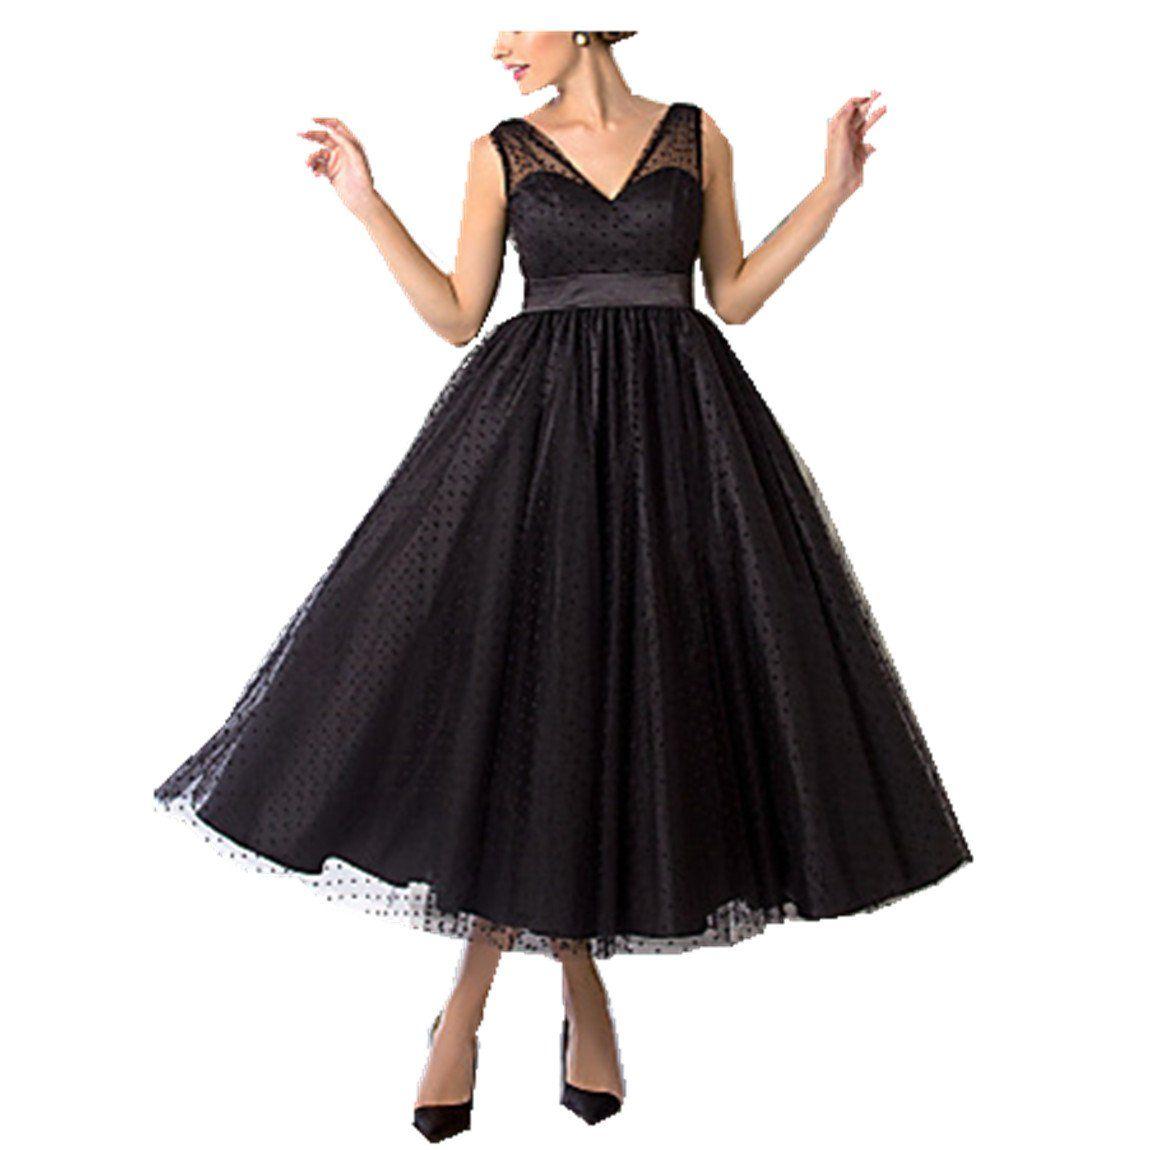 Dressesonline womenus s prom dresses tea length evening dresses